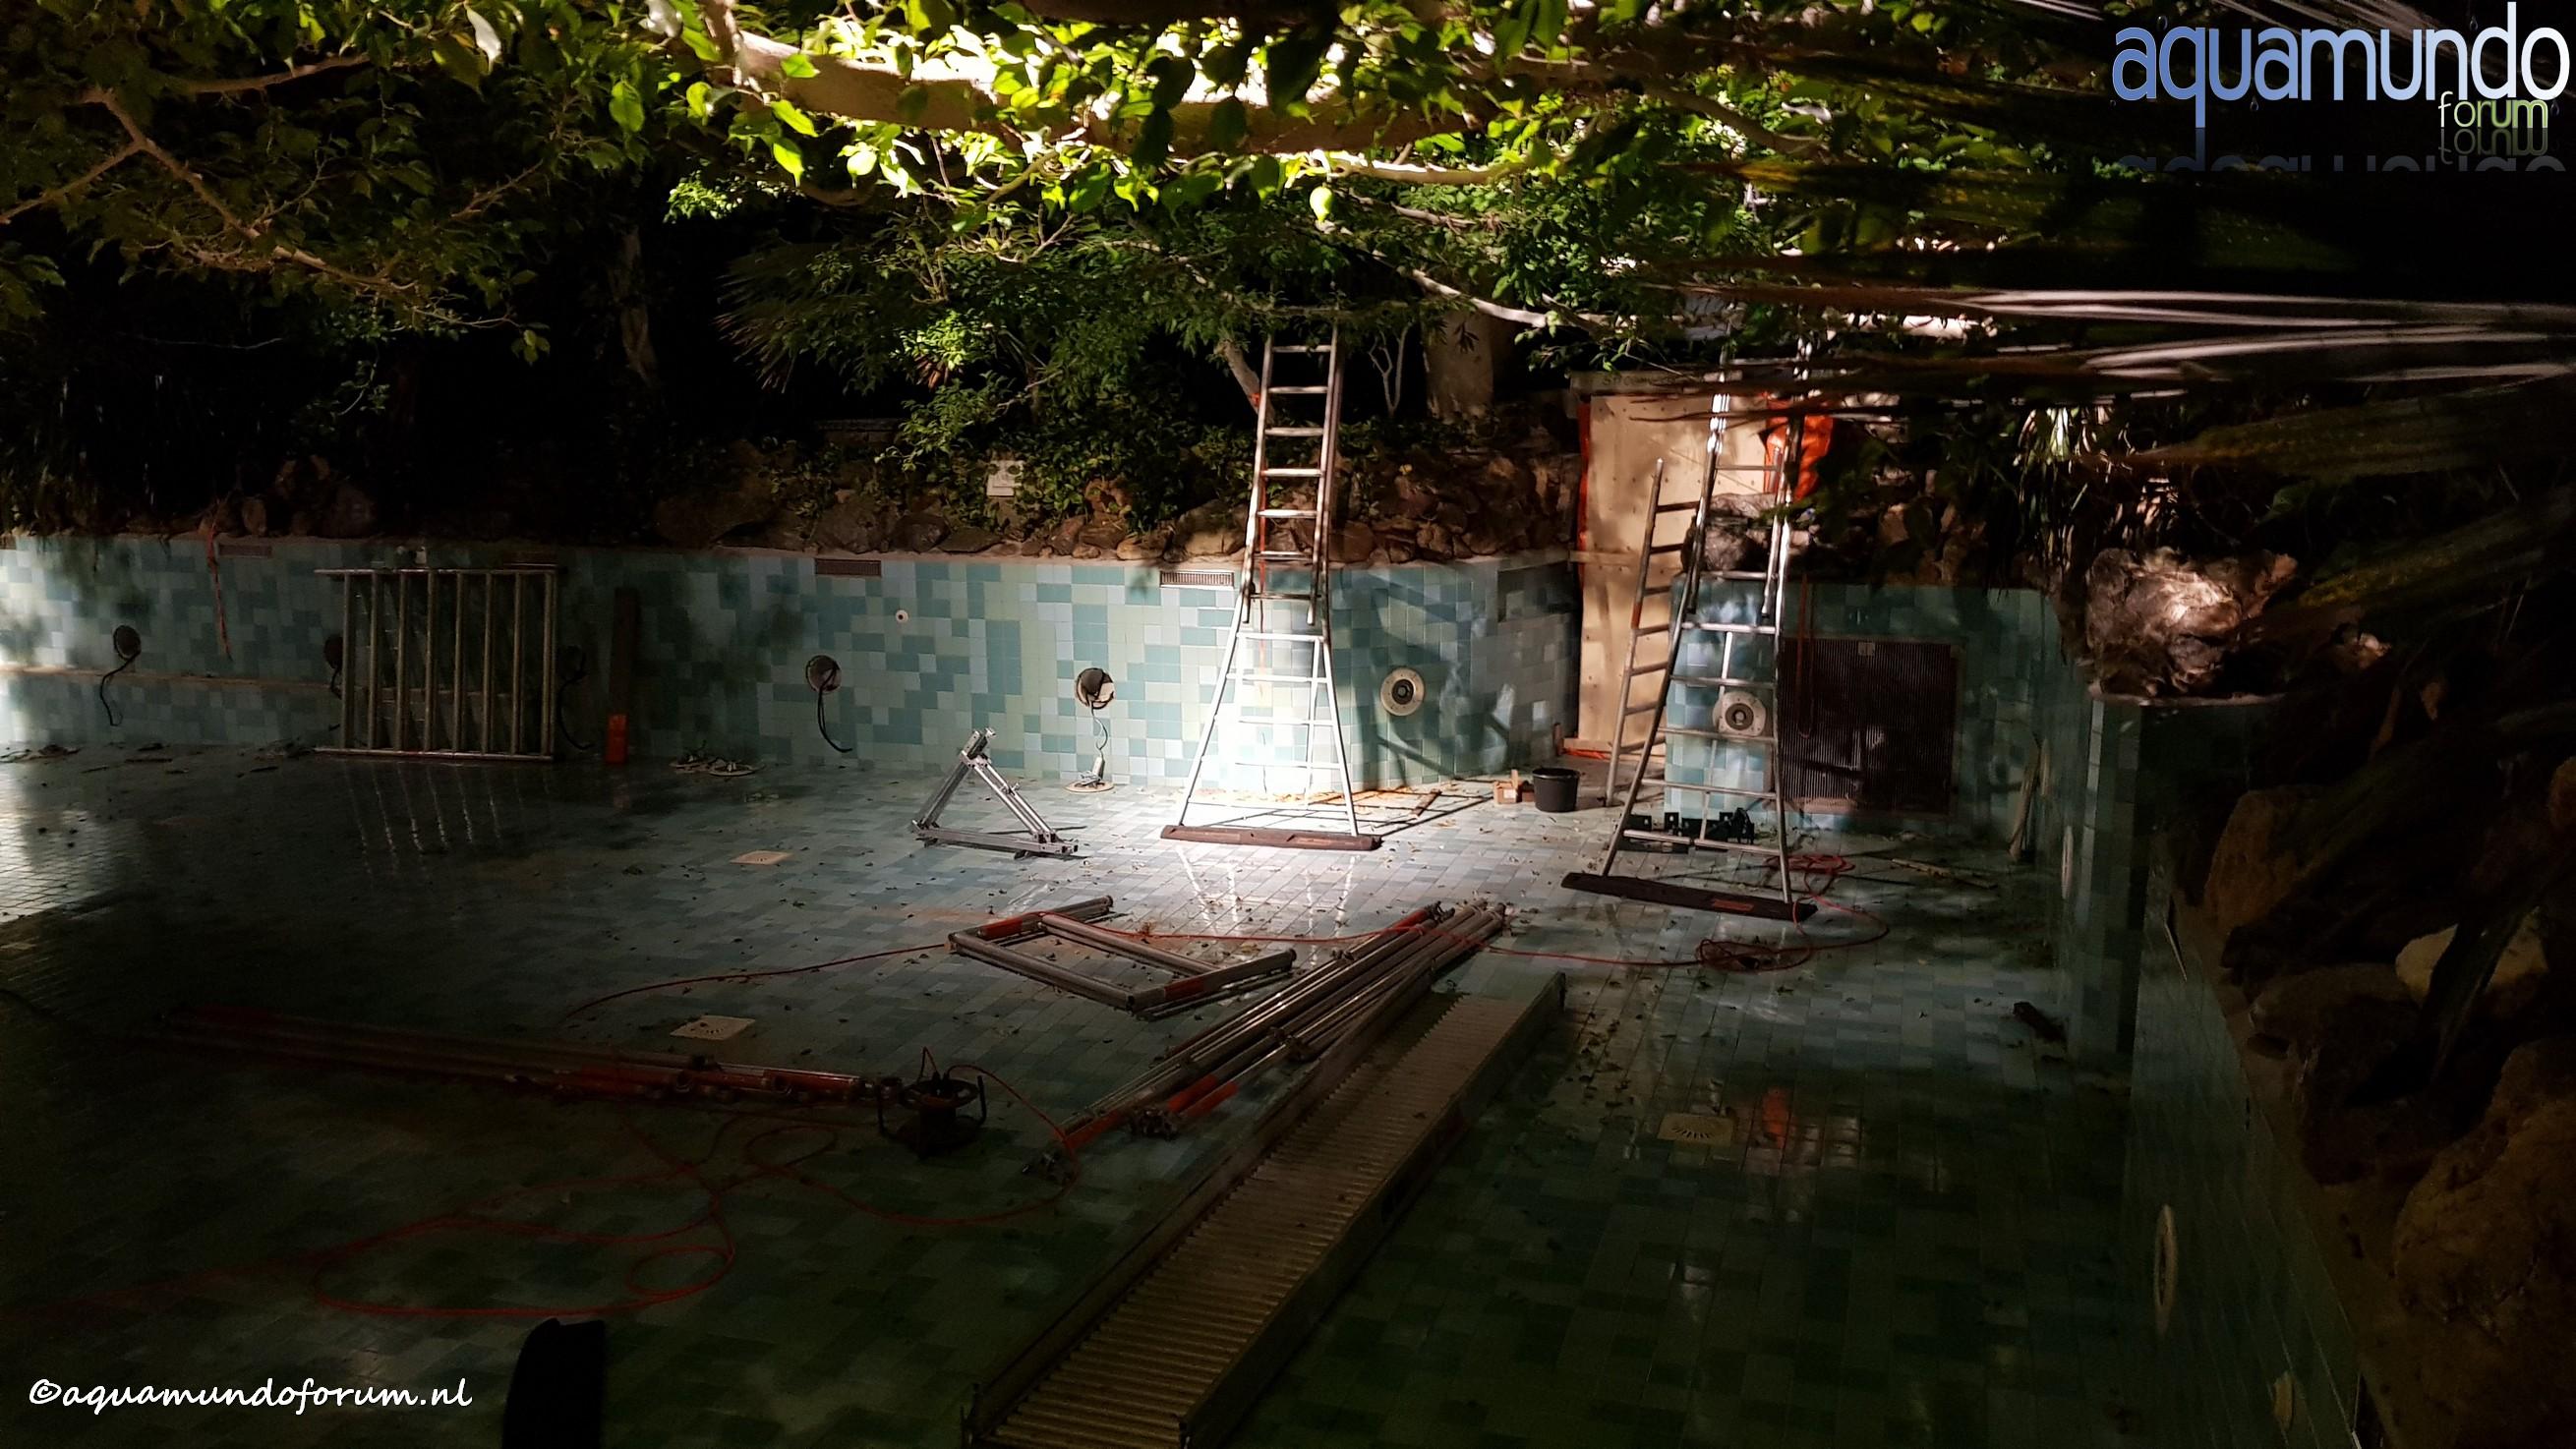 Onderhoud 25 meterbad Aqua Mundo Center Parcs De Huttenheugte (1).jpg